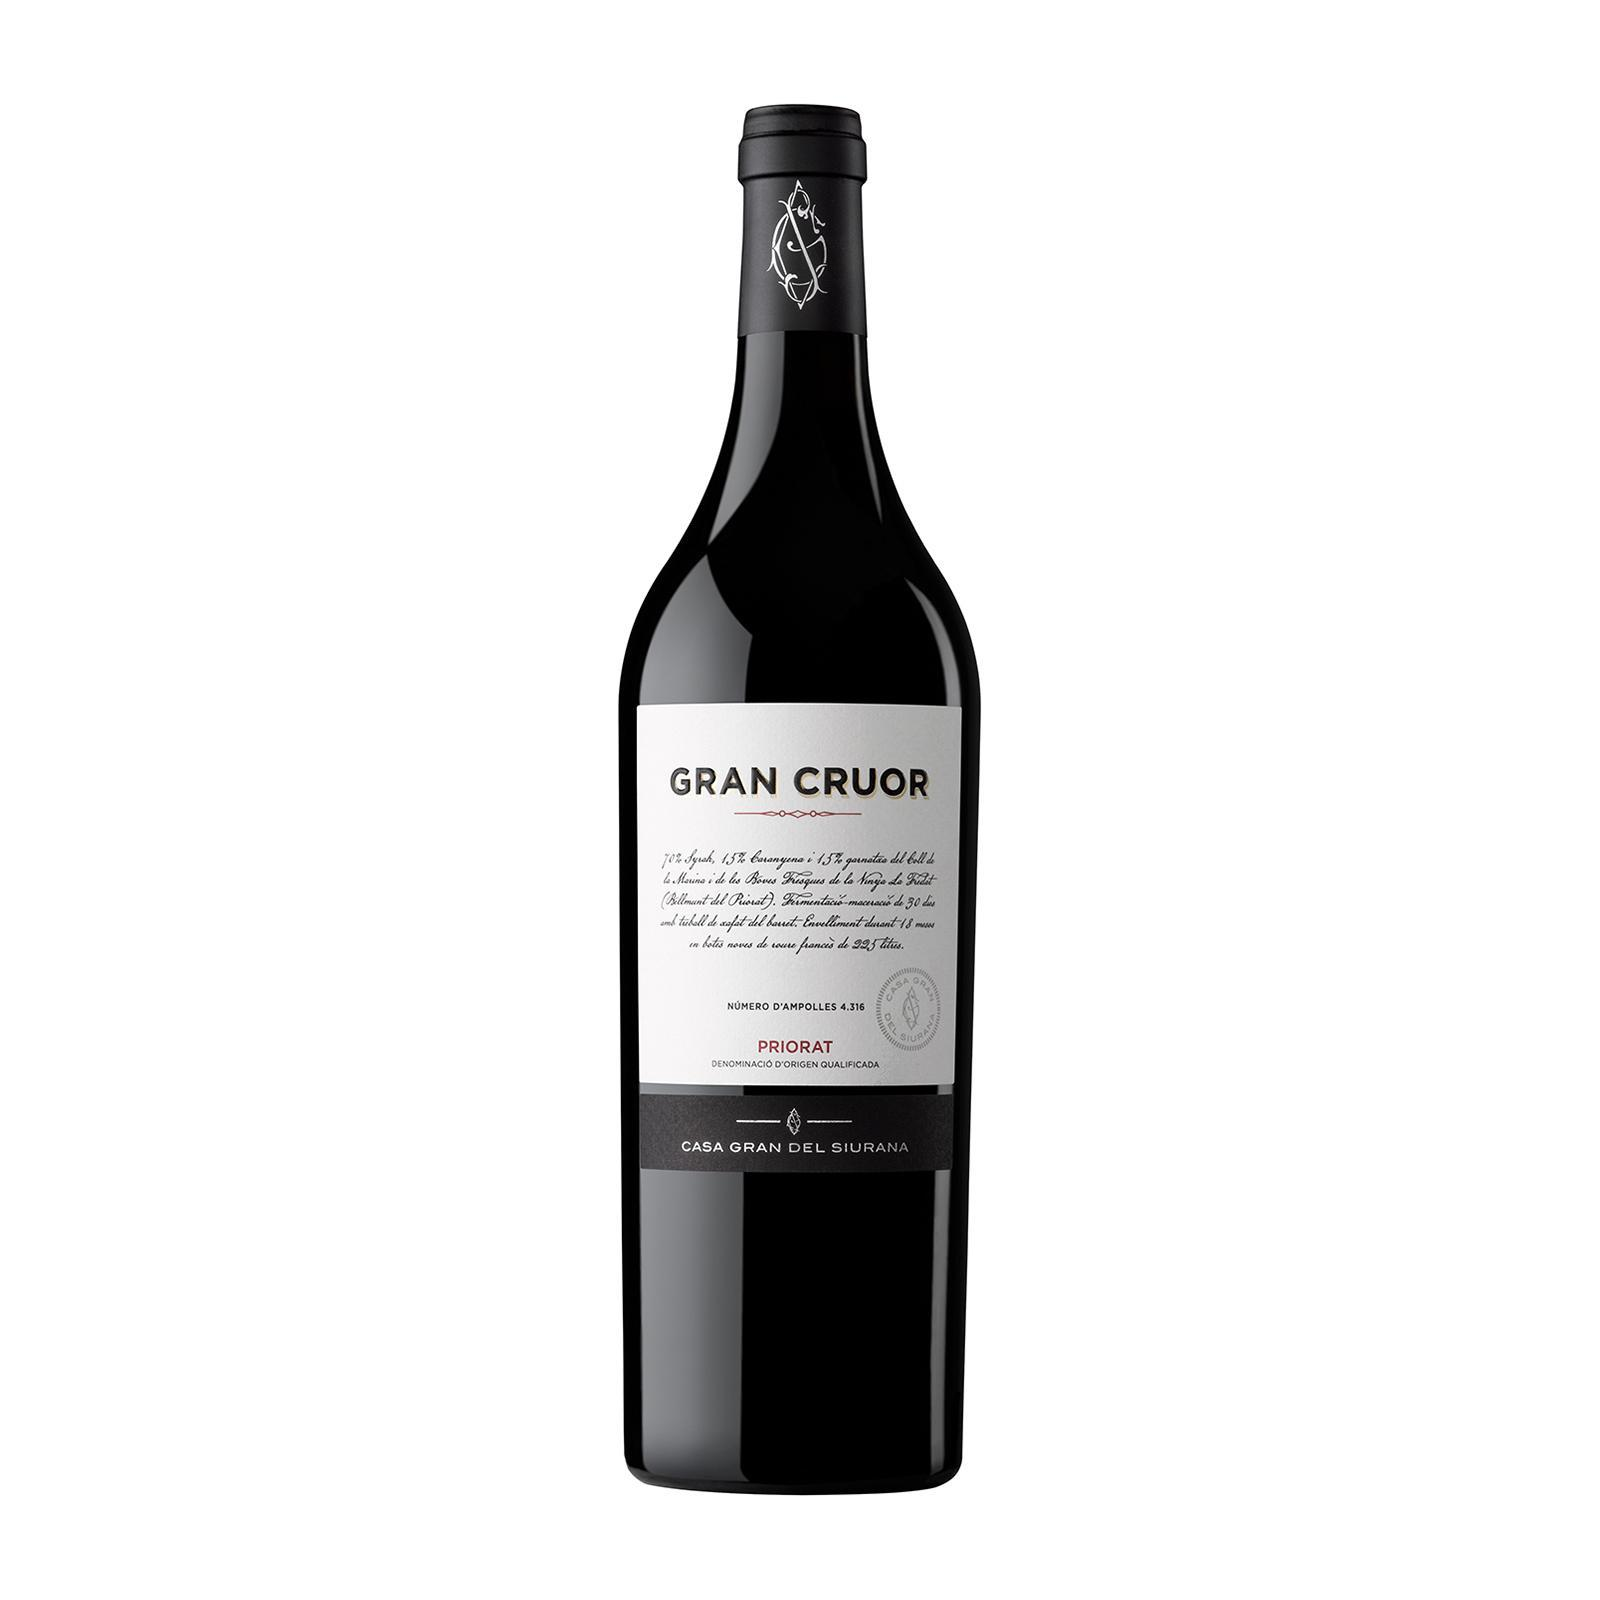 Casa Gran Del Siurana Gran Cruor 2011 Spanish Wine - By TANINOS